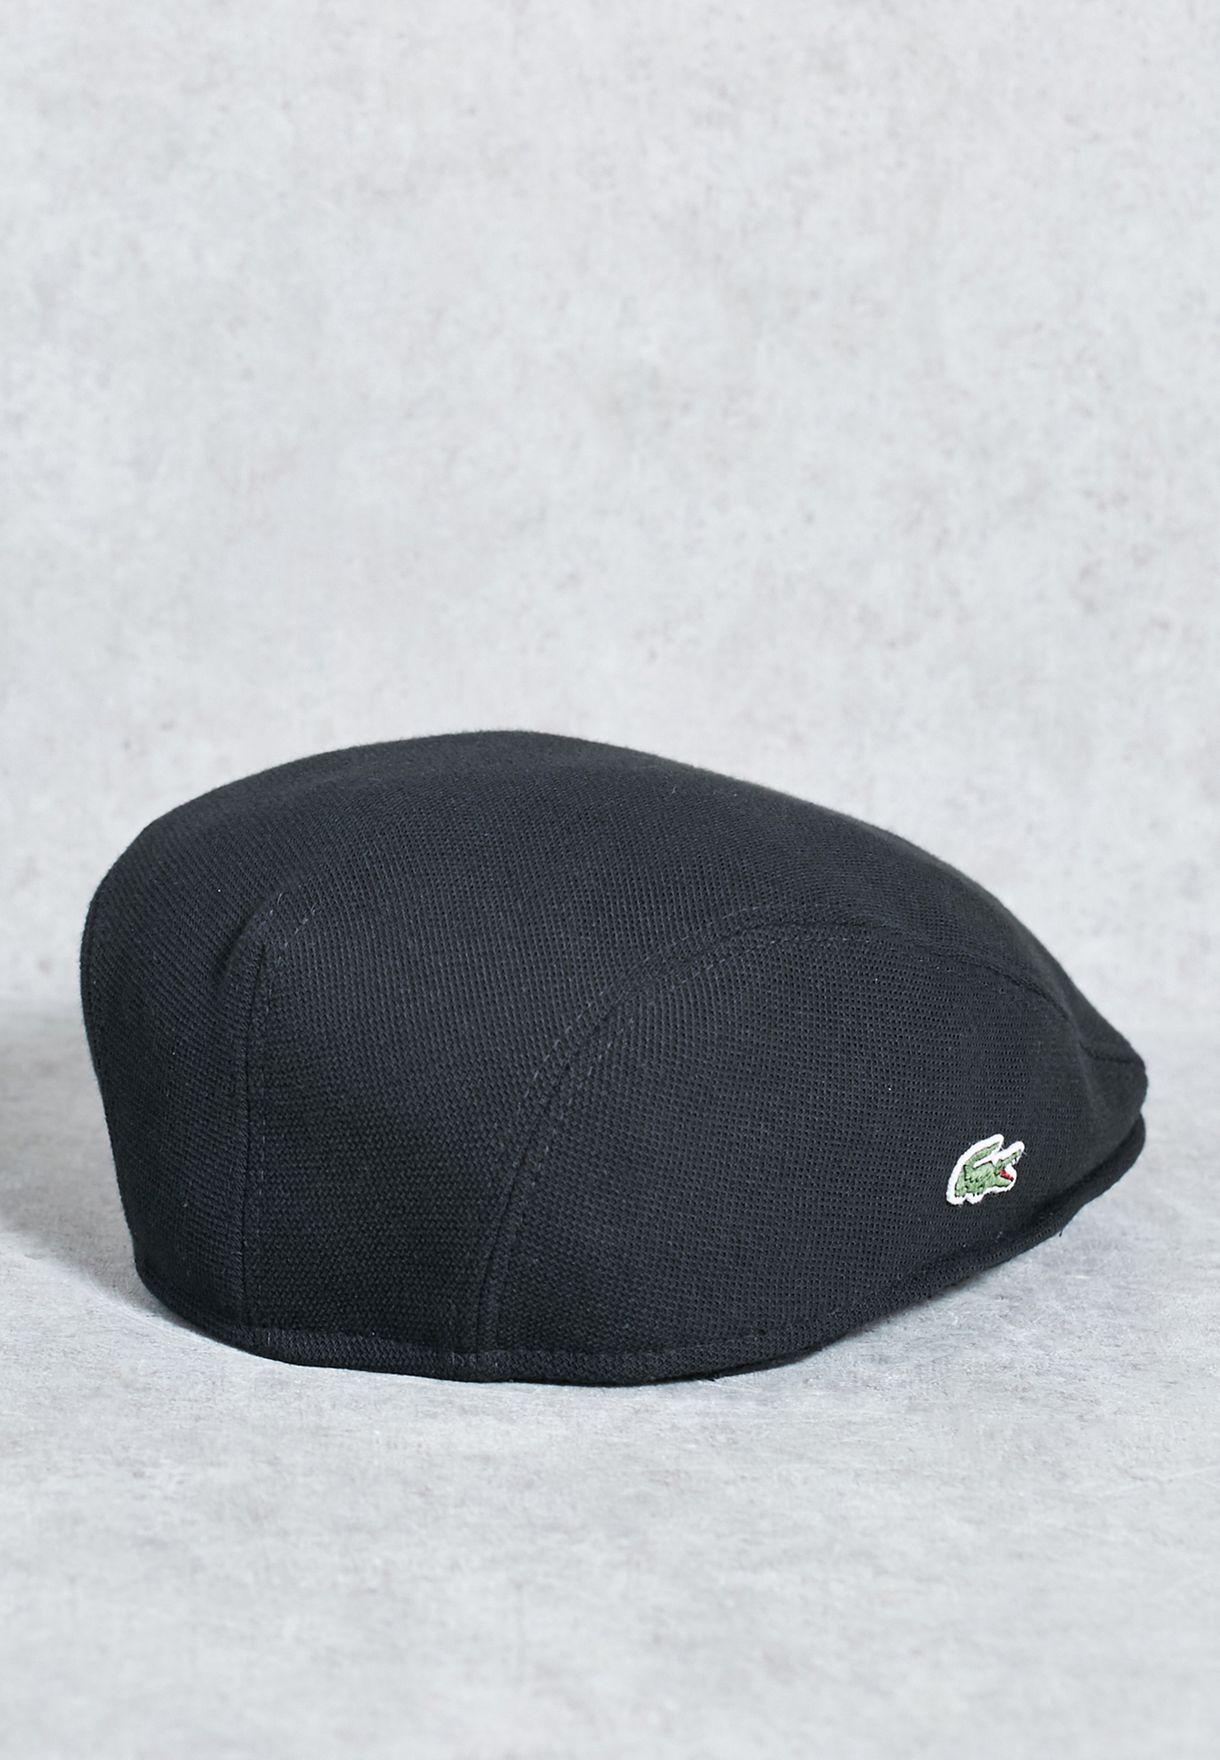 43ededb033d Shop Lacoste black Theme 1 Cap RK0345-00-031 for Men in Qatar ...